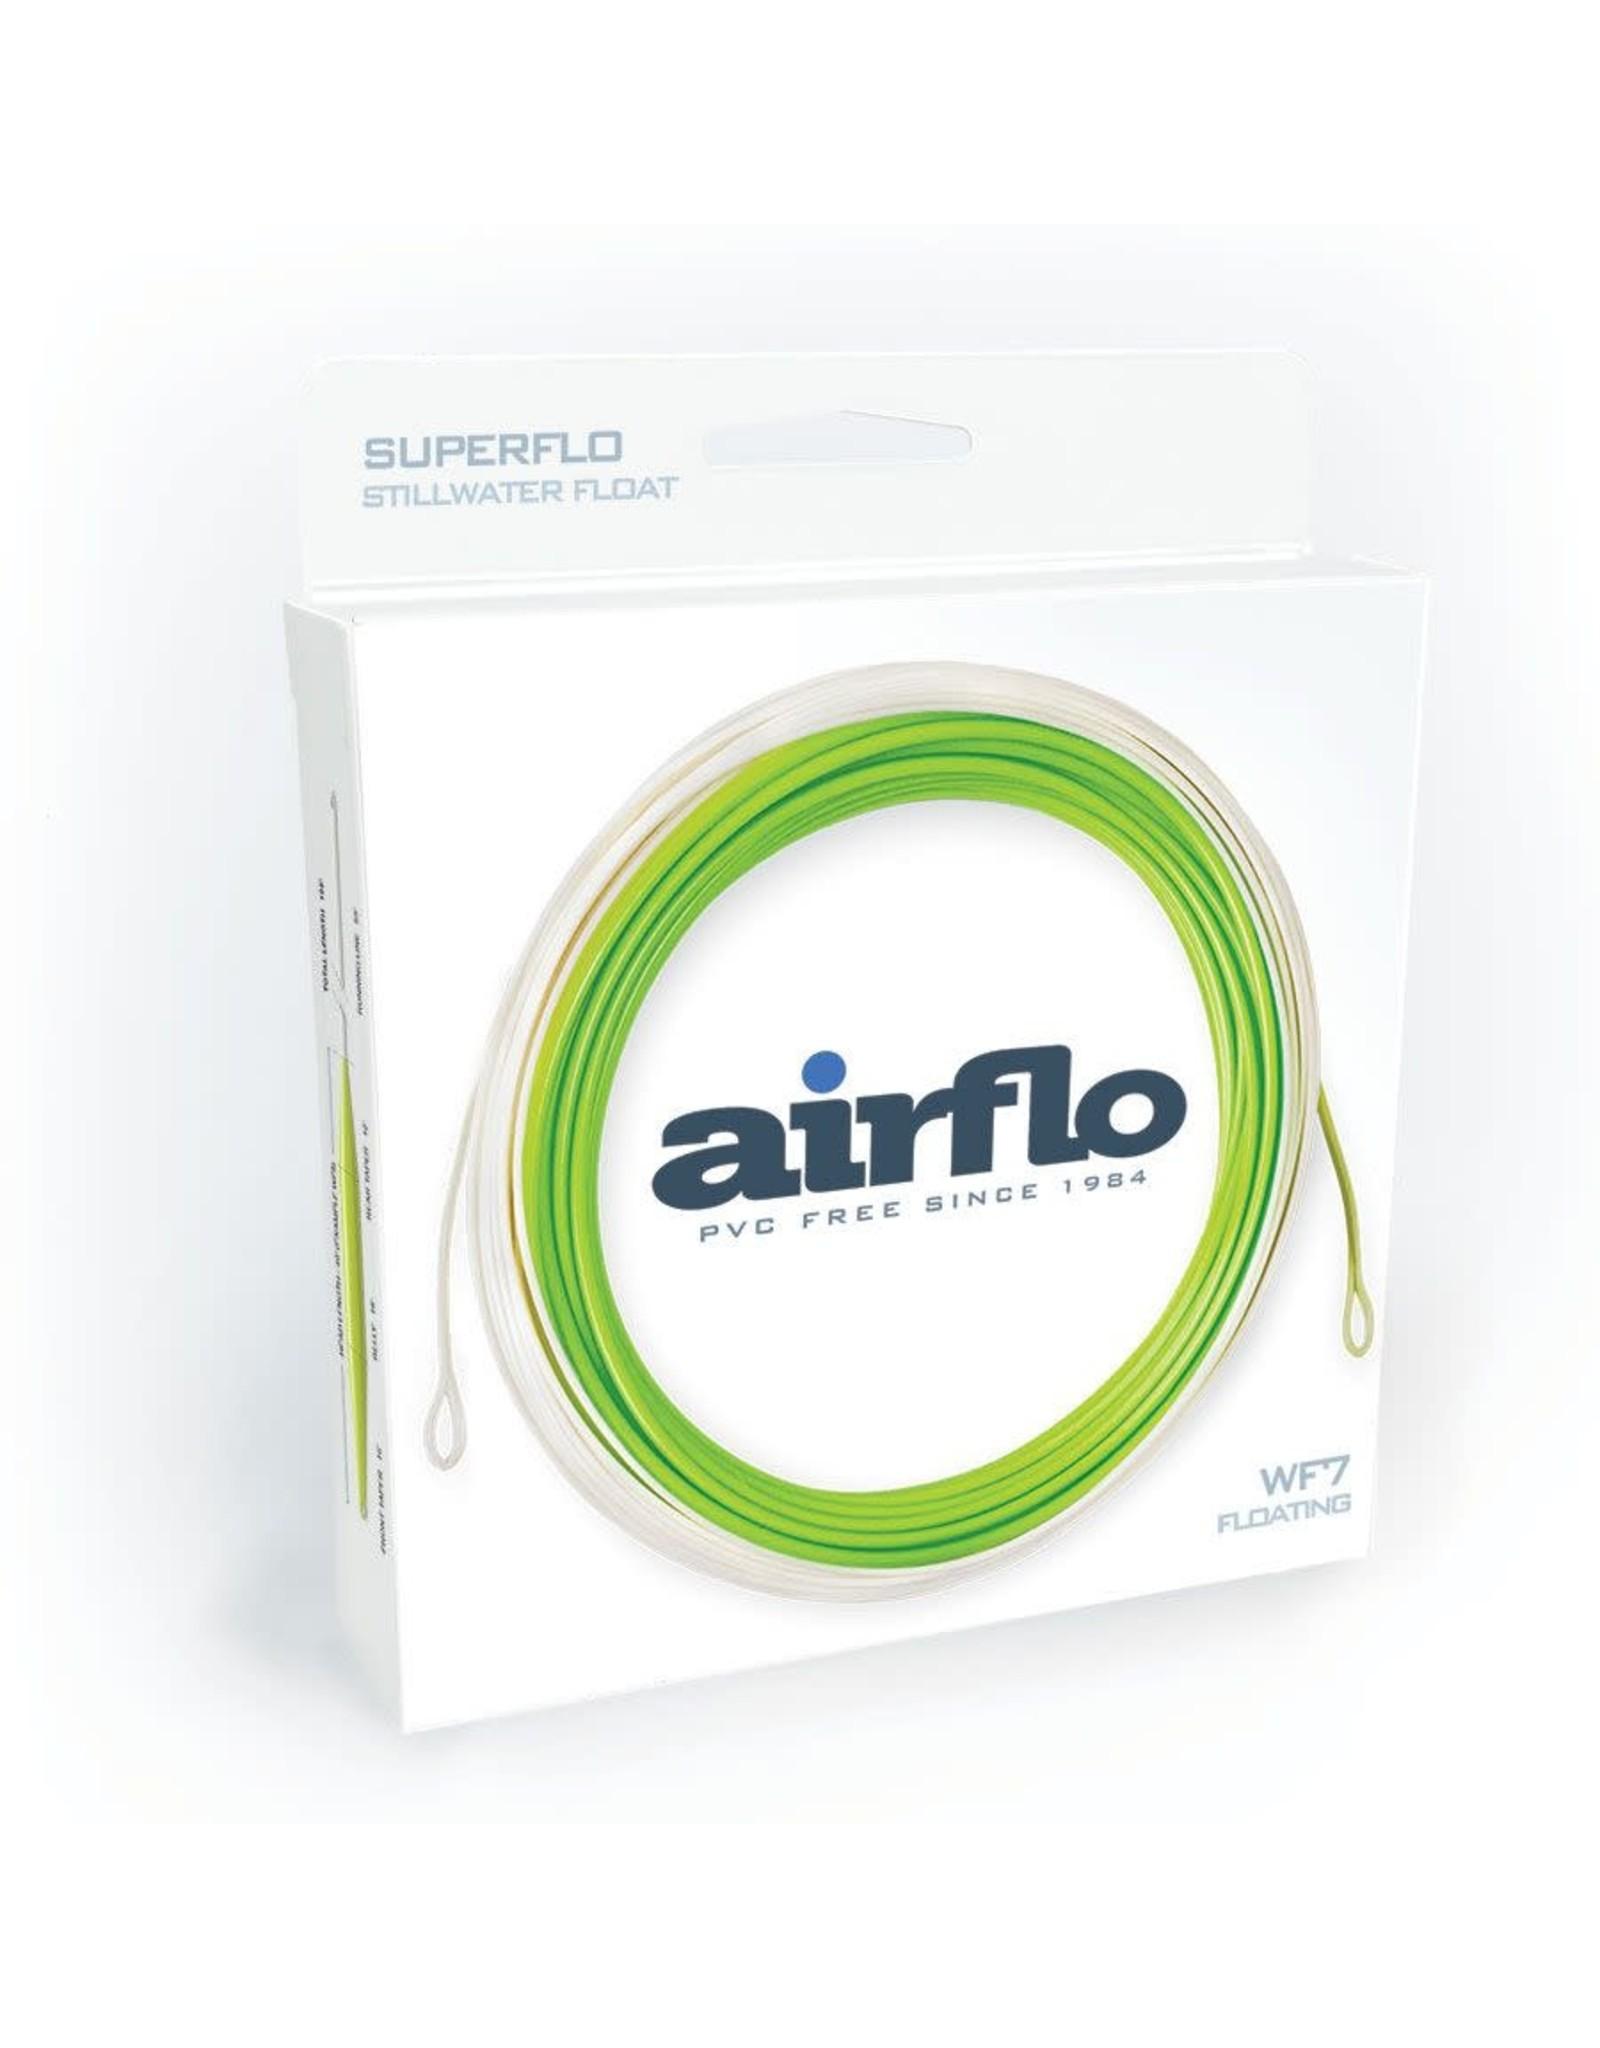 Airflo Airflo Superflo Stillwater Taper Floating